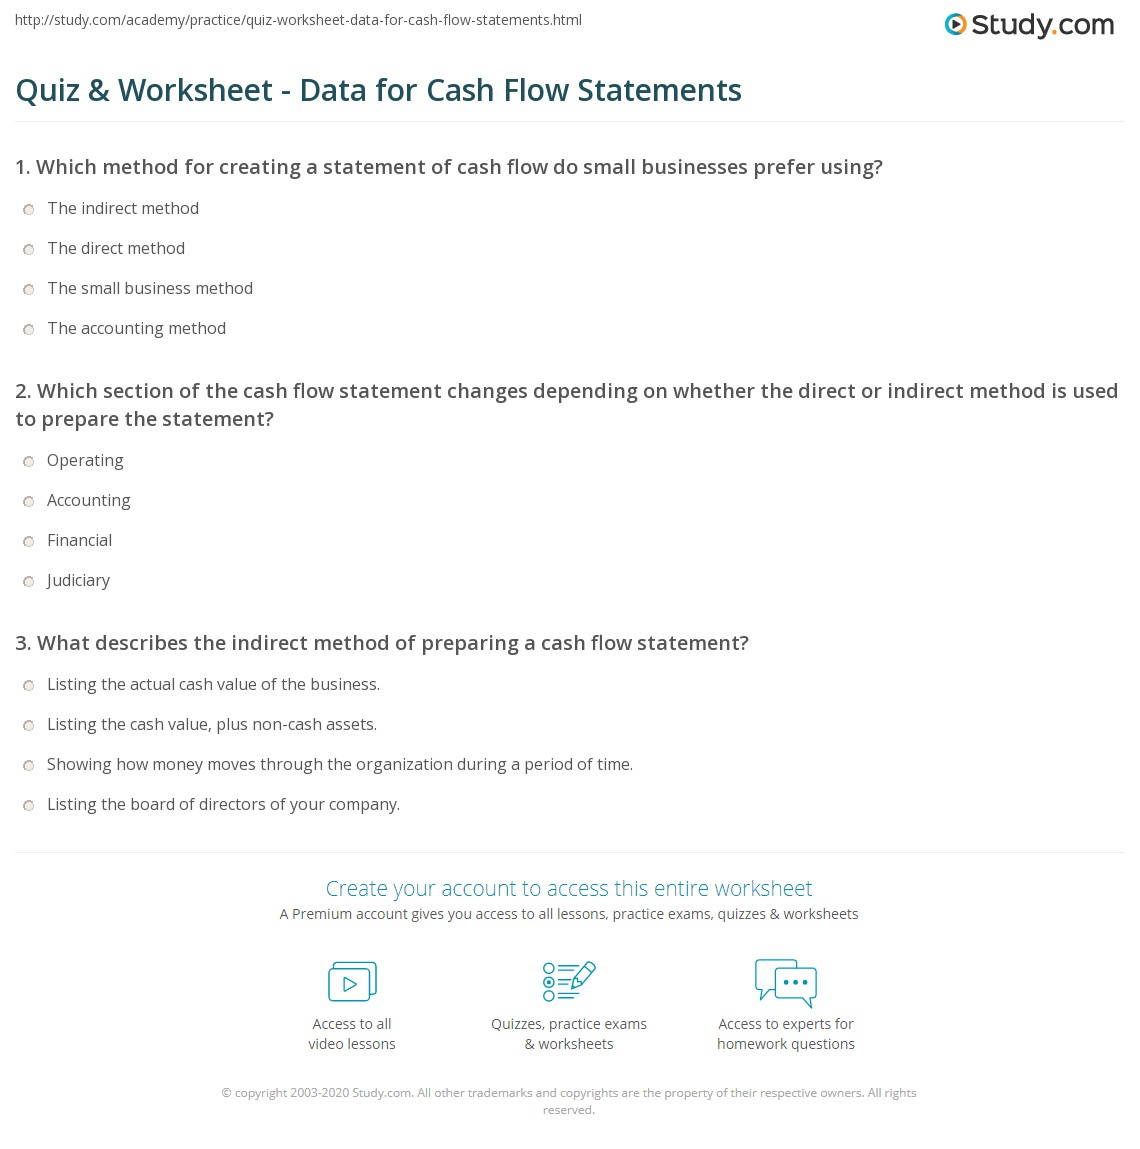 Worksheets Cash Flow Statement Worksheet quiz worksheet data for cash flow statements study com print sources needed to prepare the statement worksheet